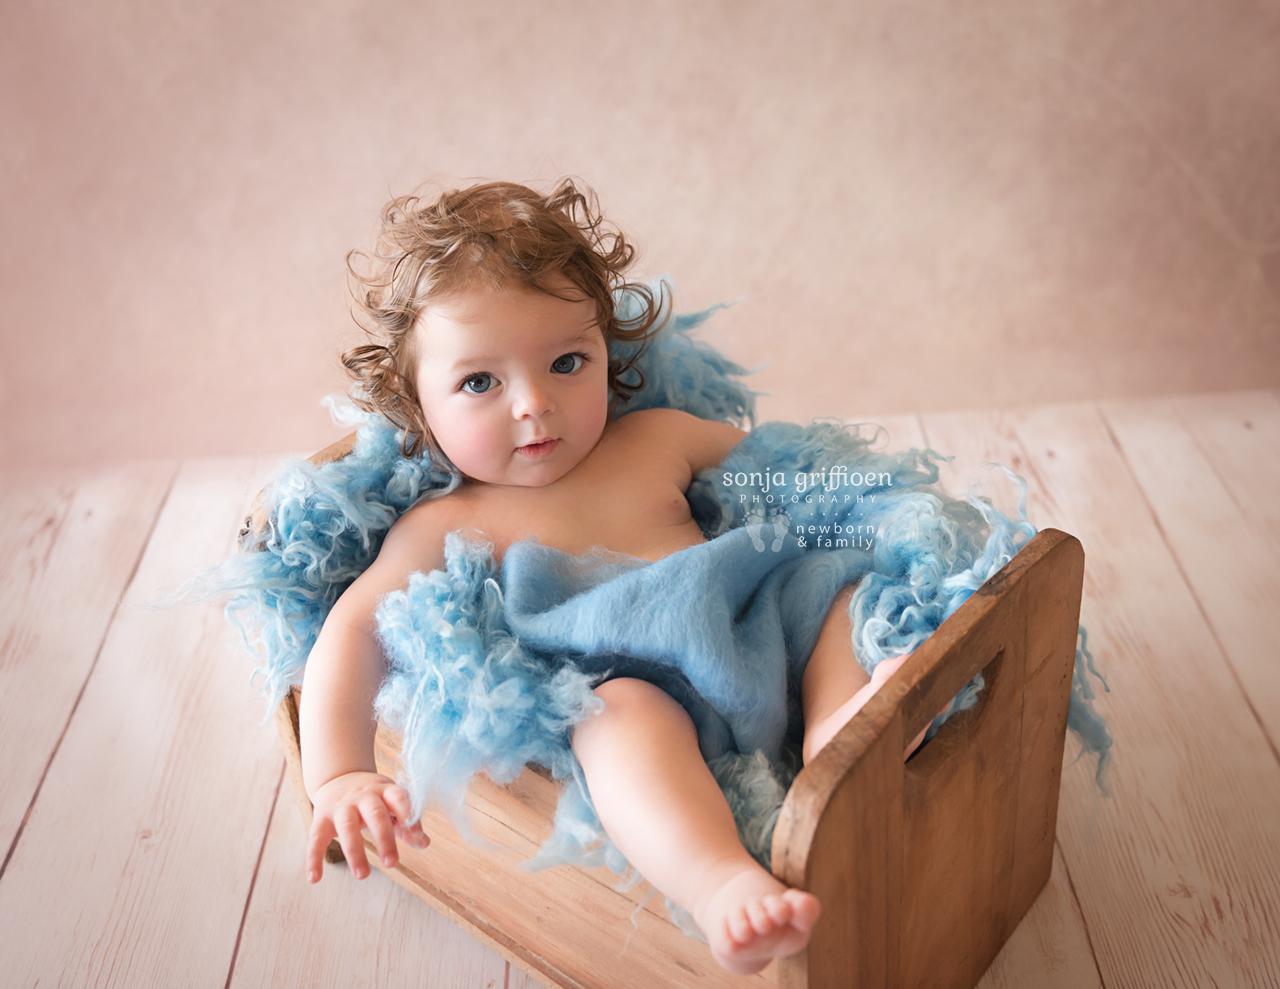 Harry-Milestone-Brisbane-Baby-Photographer-Sonja-Griffioen-05.jpg